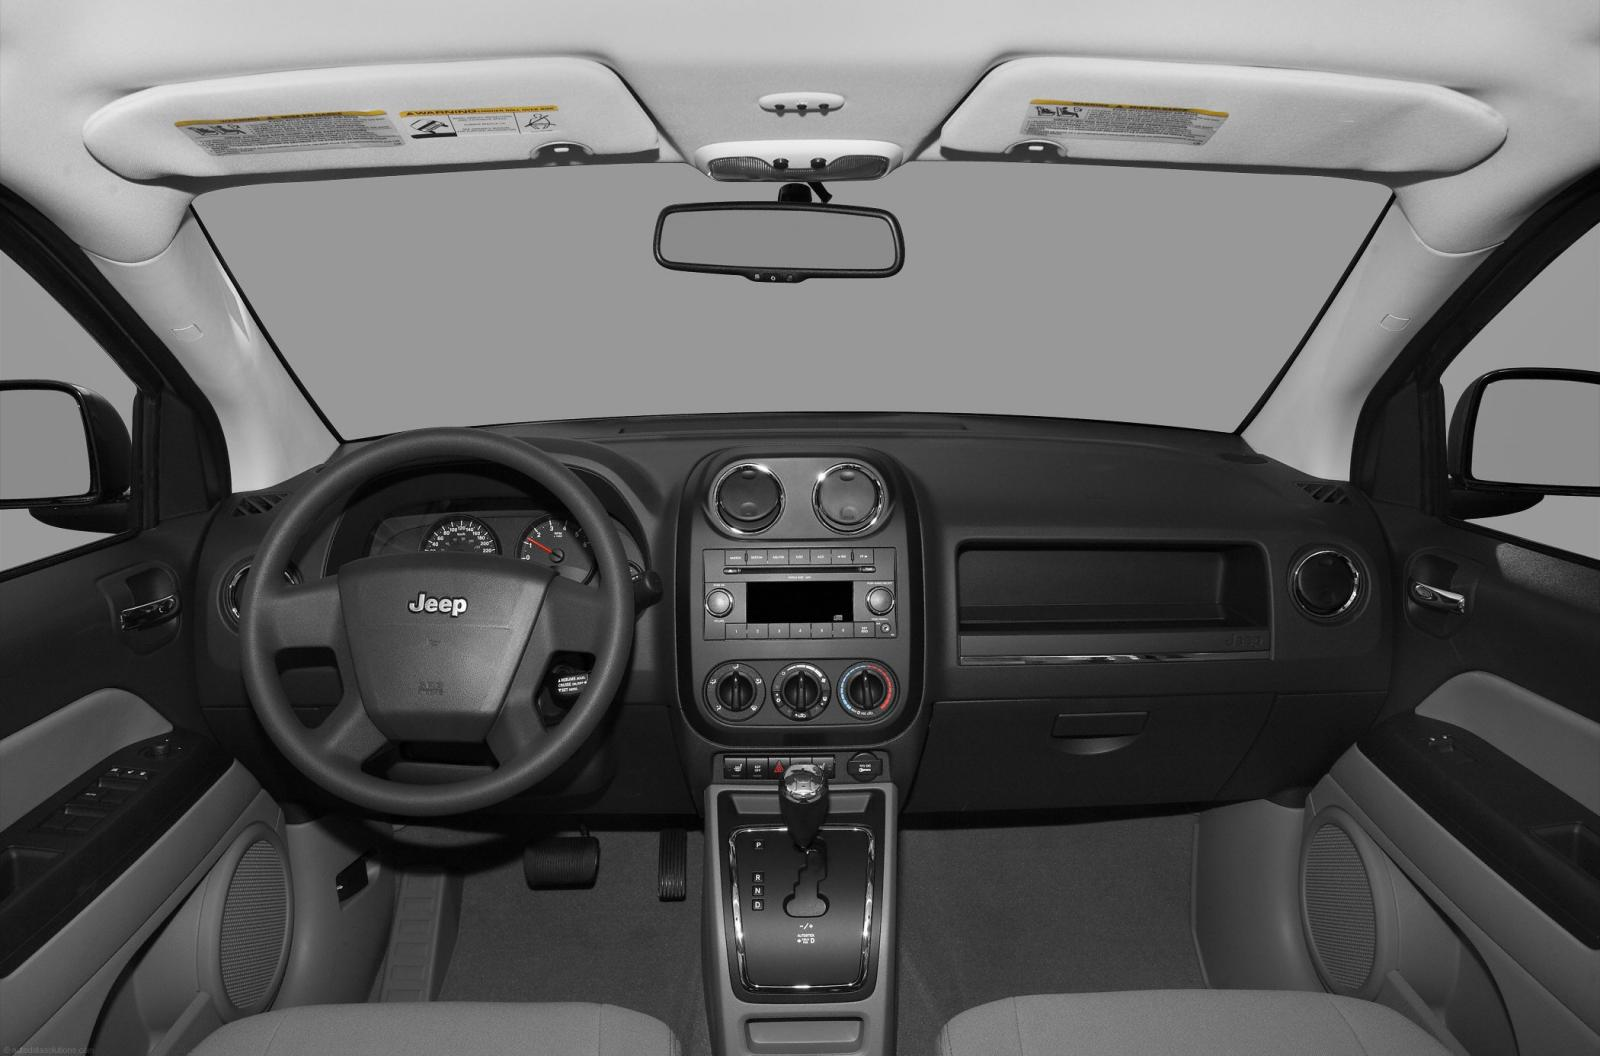 800 1024 1280 1600 Origin 2010 Jeep Compass ...